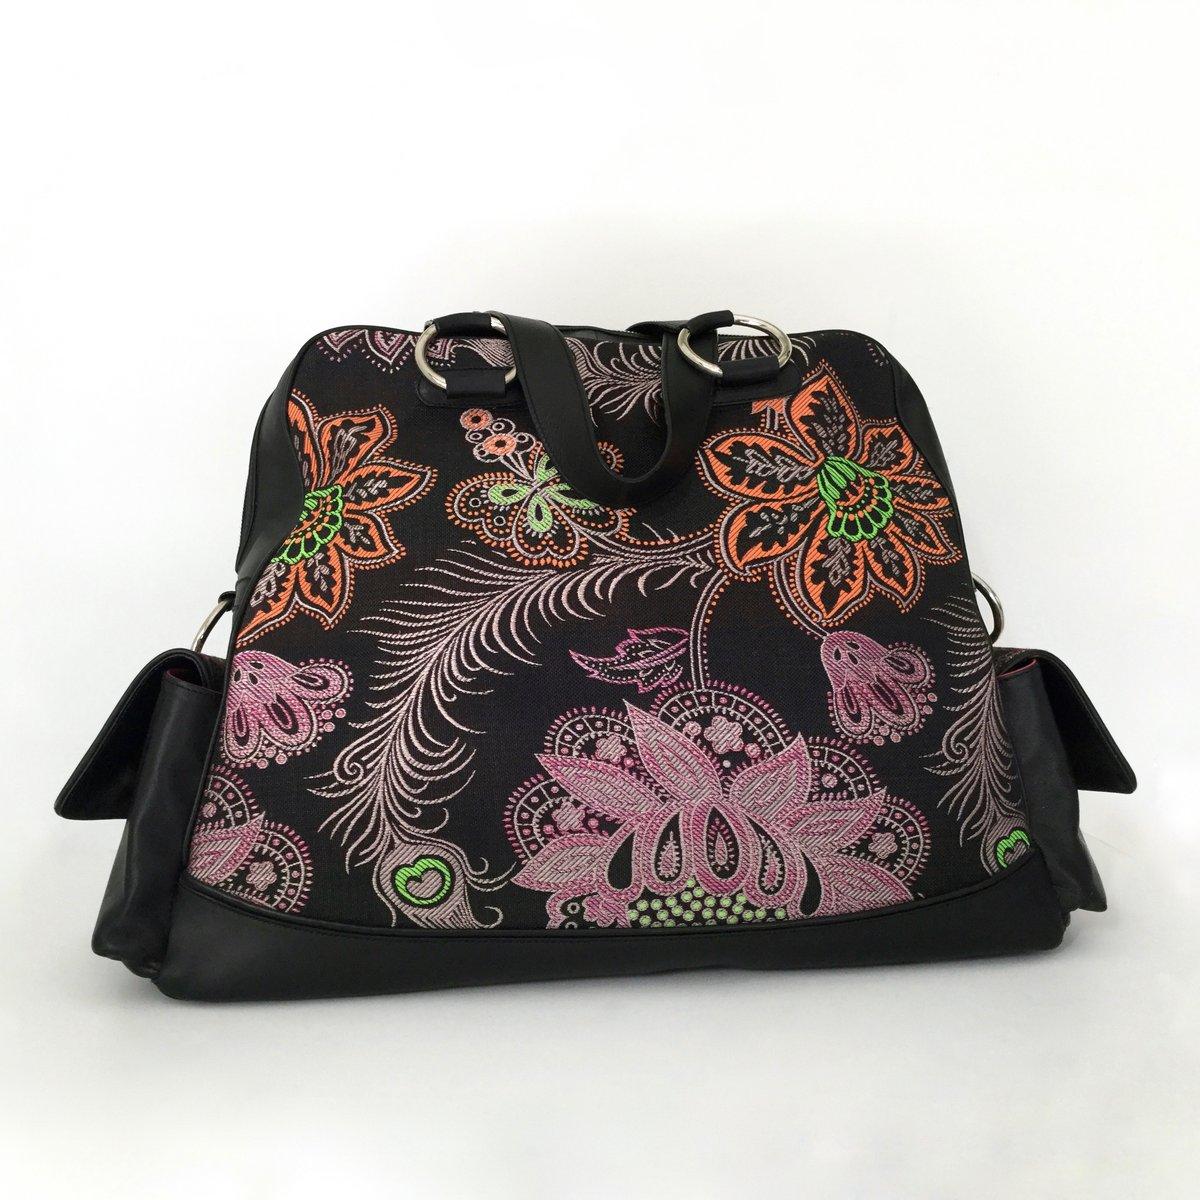 Image of Matthew Williamson Spring 2005 Tapestry Bag